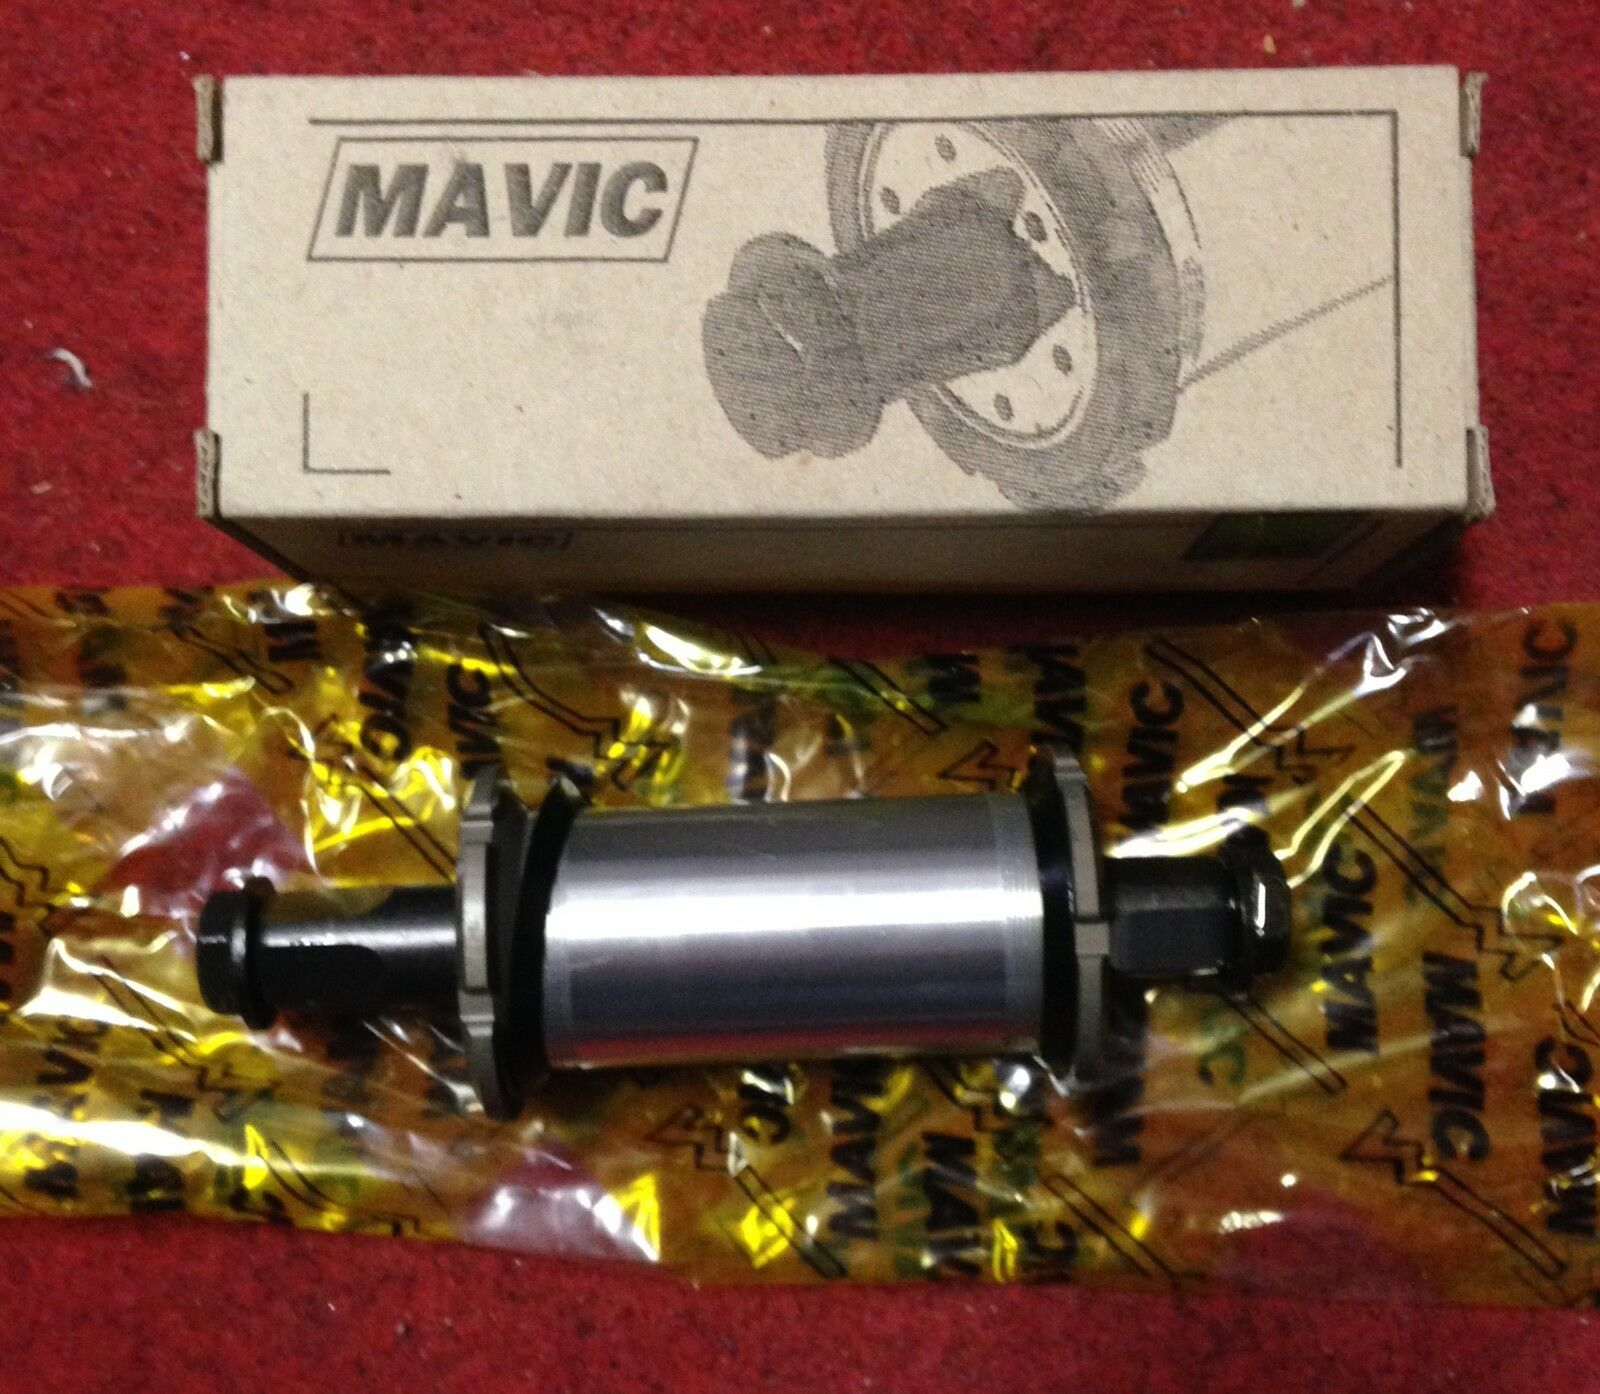 Bike Bottom Bracket Mavic 610 URD 123mm movimento movimento movimento centrale bici made in France 0b09bb